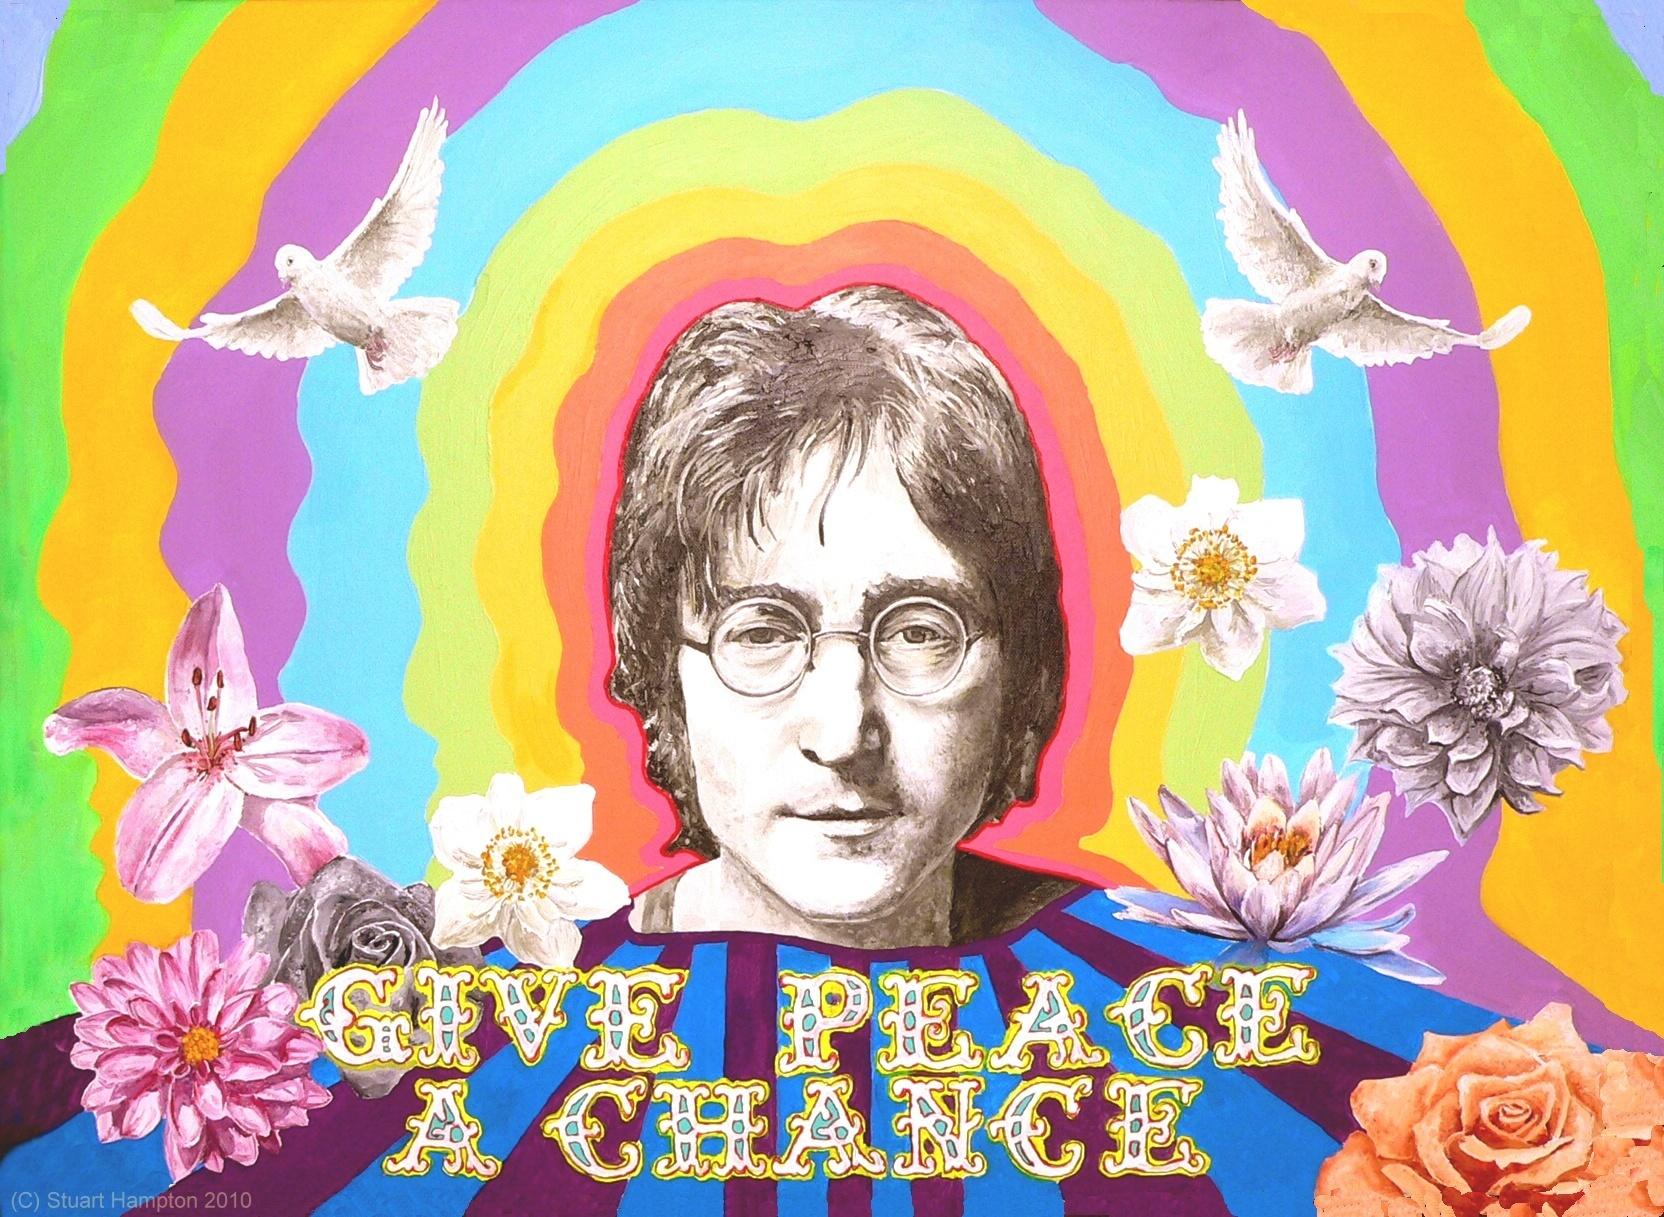 HAPPY 75TH JOHN LENNON John-Lennon-john-lennon-10226277-1664-1217